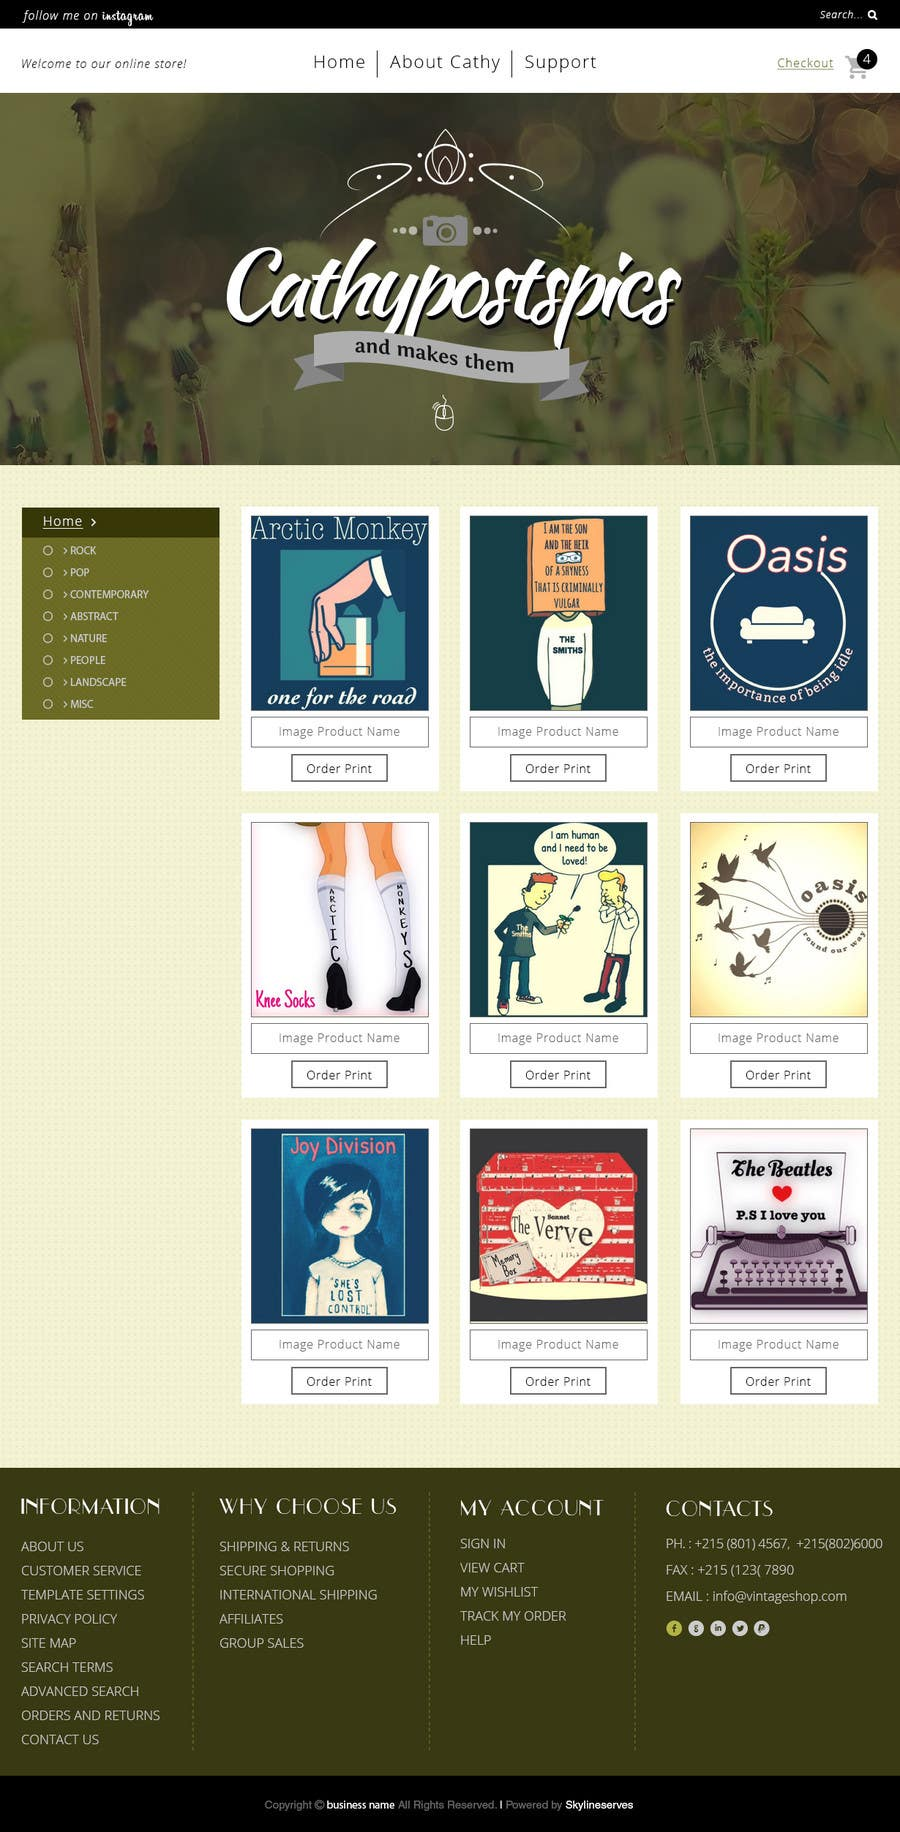 Penyertaan Peraduan #40 untuk Cathy Posts Pics - Website Design